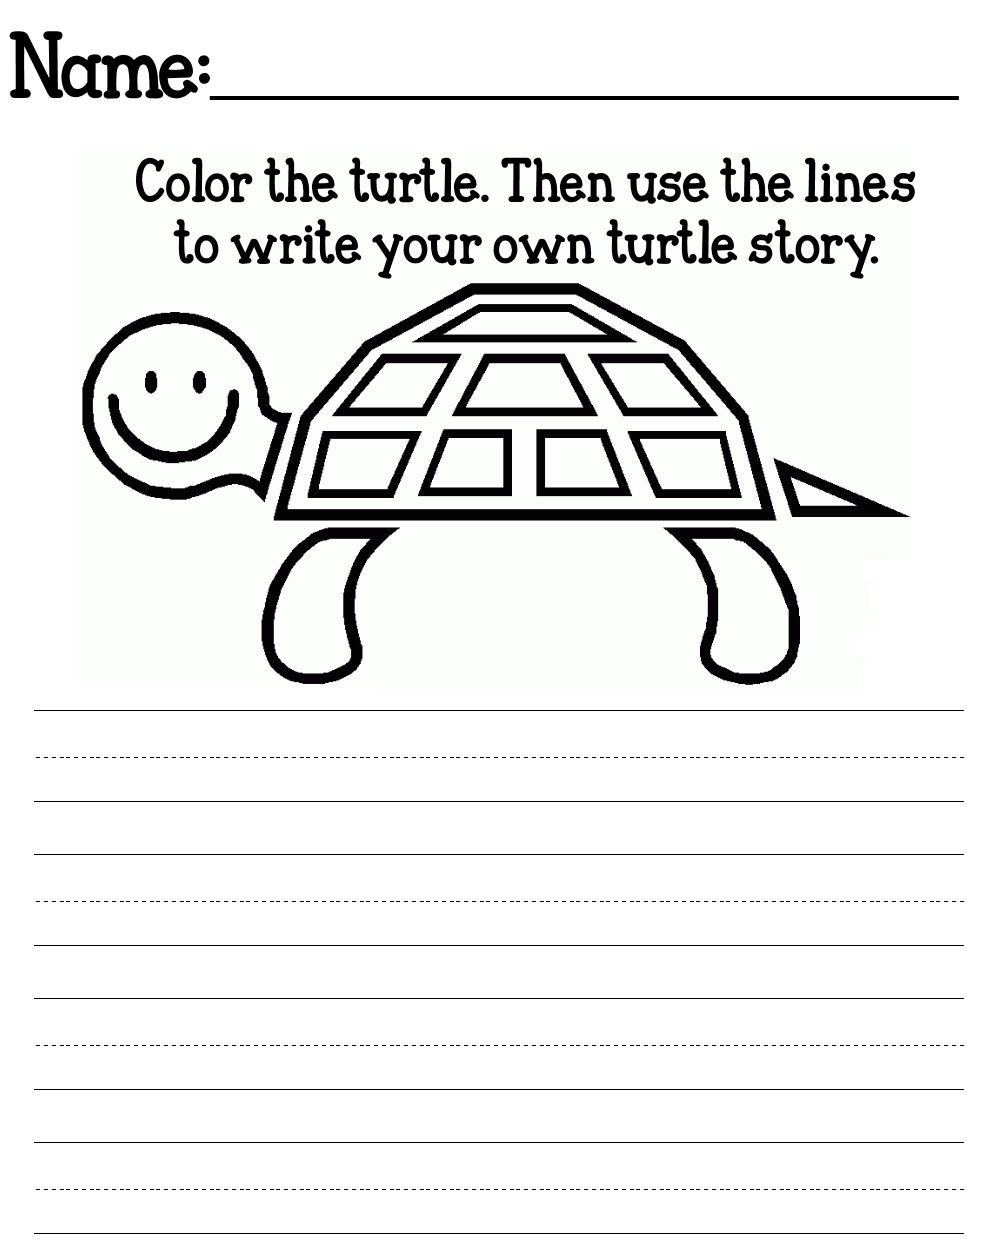 Free Yertle The Turtle Printables Mysunwillshine Com Seuss Classroom Teacher Printable Library Lessons